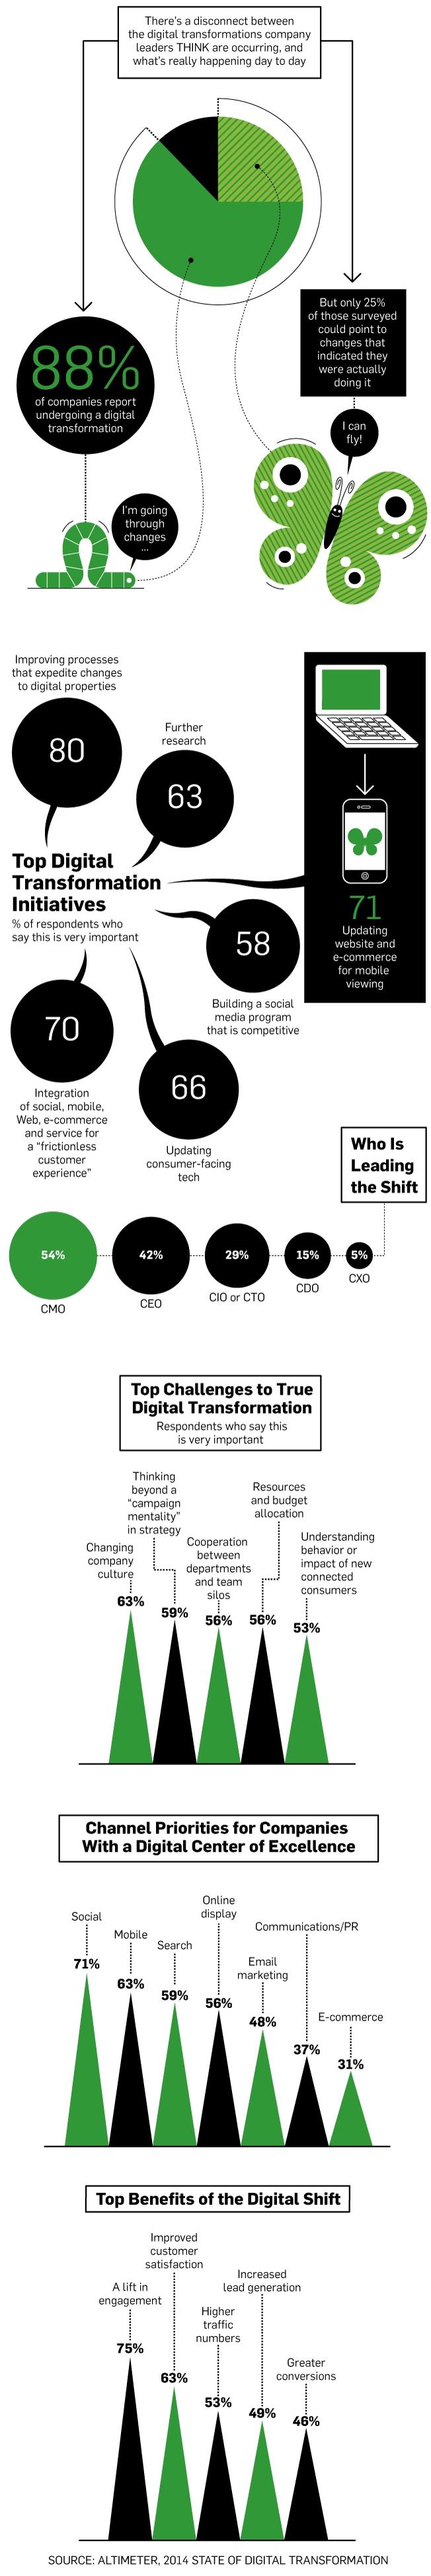 2digital-transform-01-2014_0